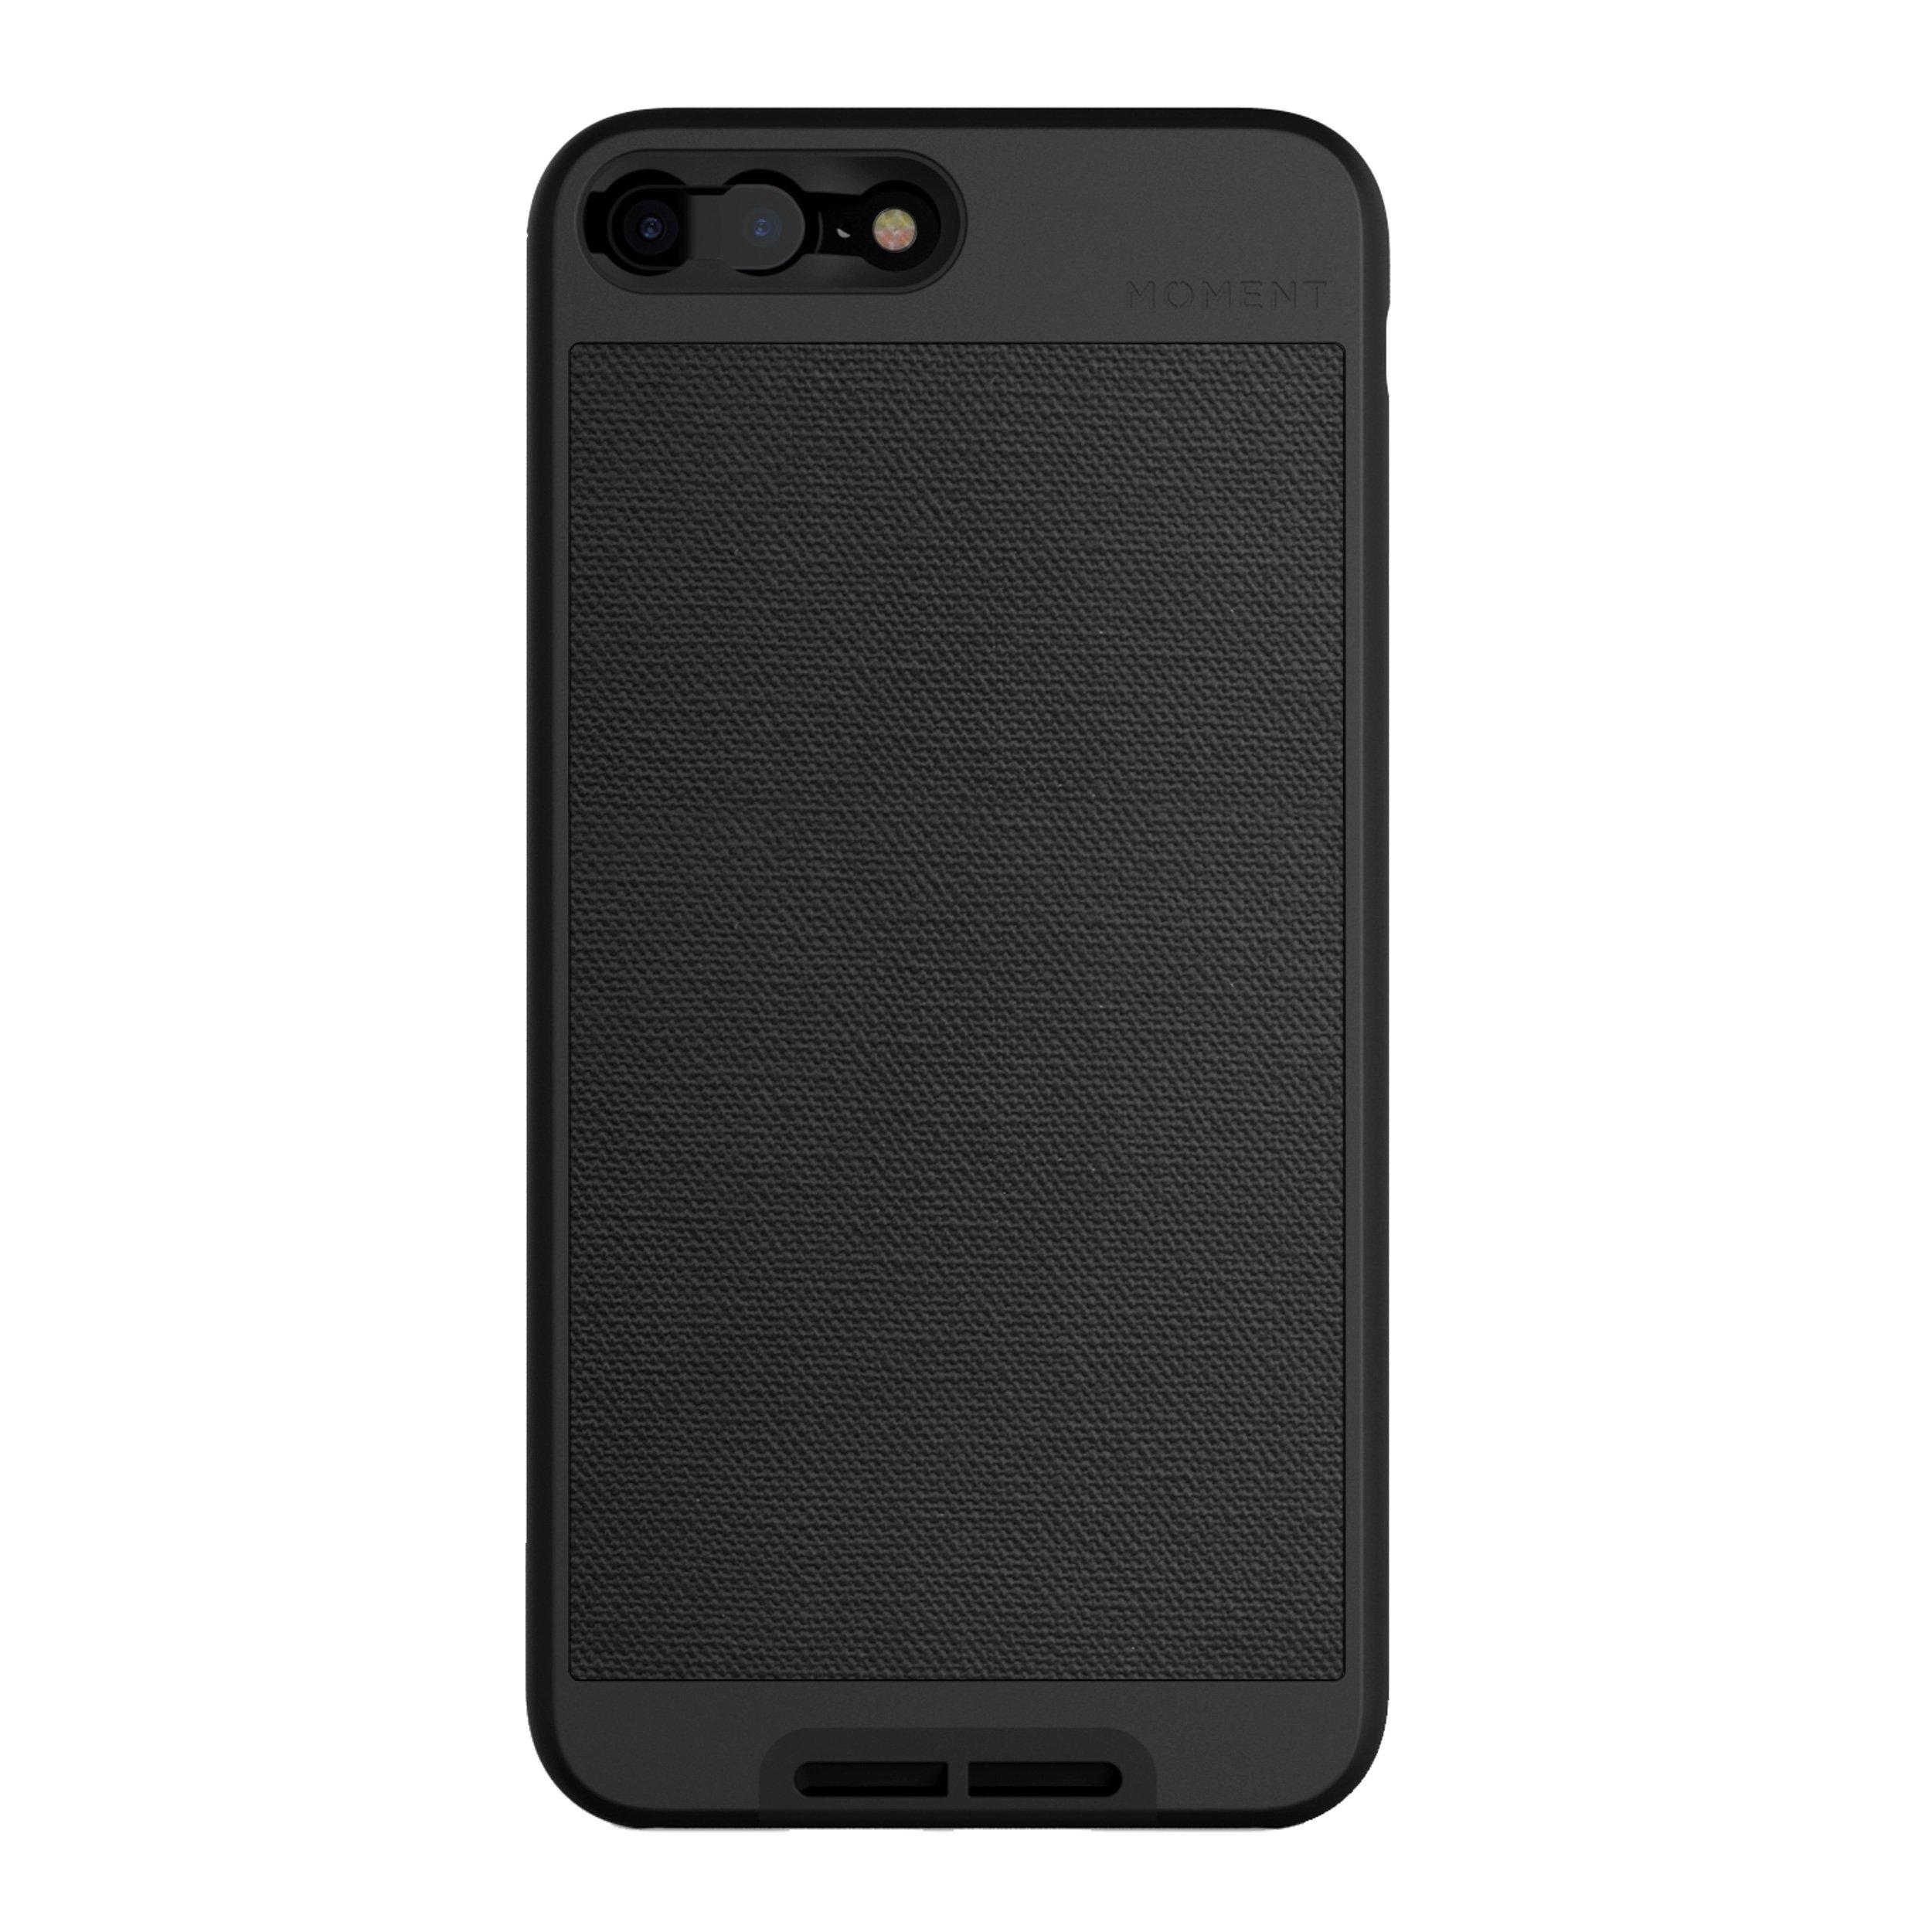 ویکالا · خرید  اصل اورجینال · خرید از آمازون · iPhone 7 Plus/iPhone 8 Plus Case || Moment Photo Case in Black Canvas - Thin, Protective, Wrist Strap Friendly case for Camera Lovers. wekala · ویکالا